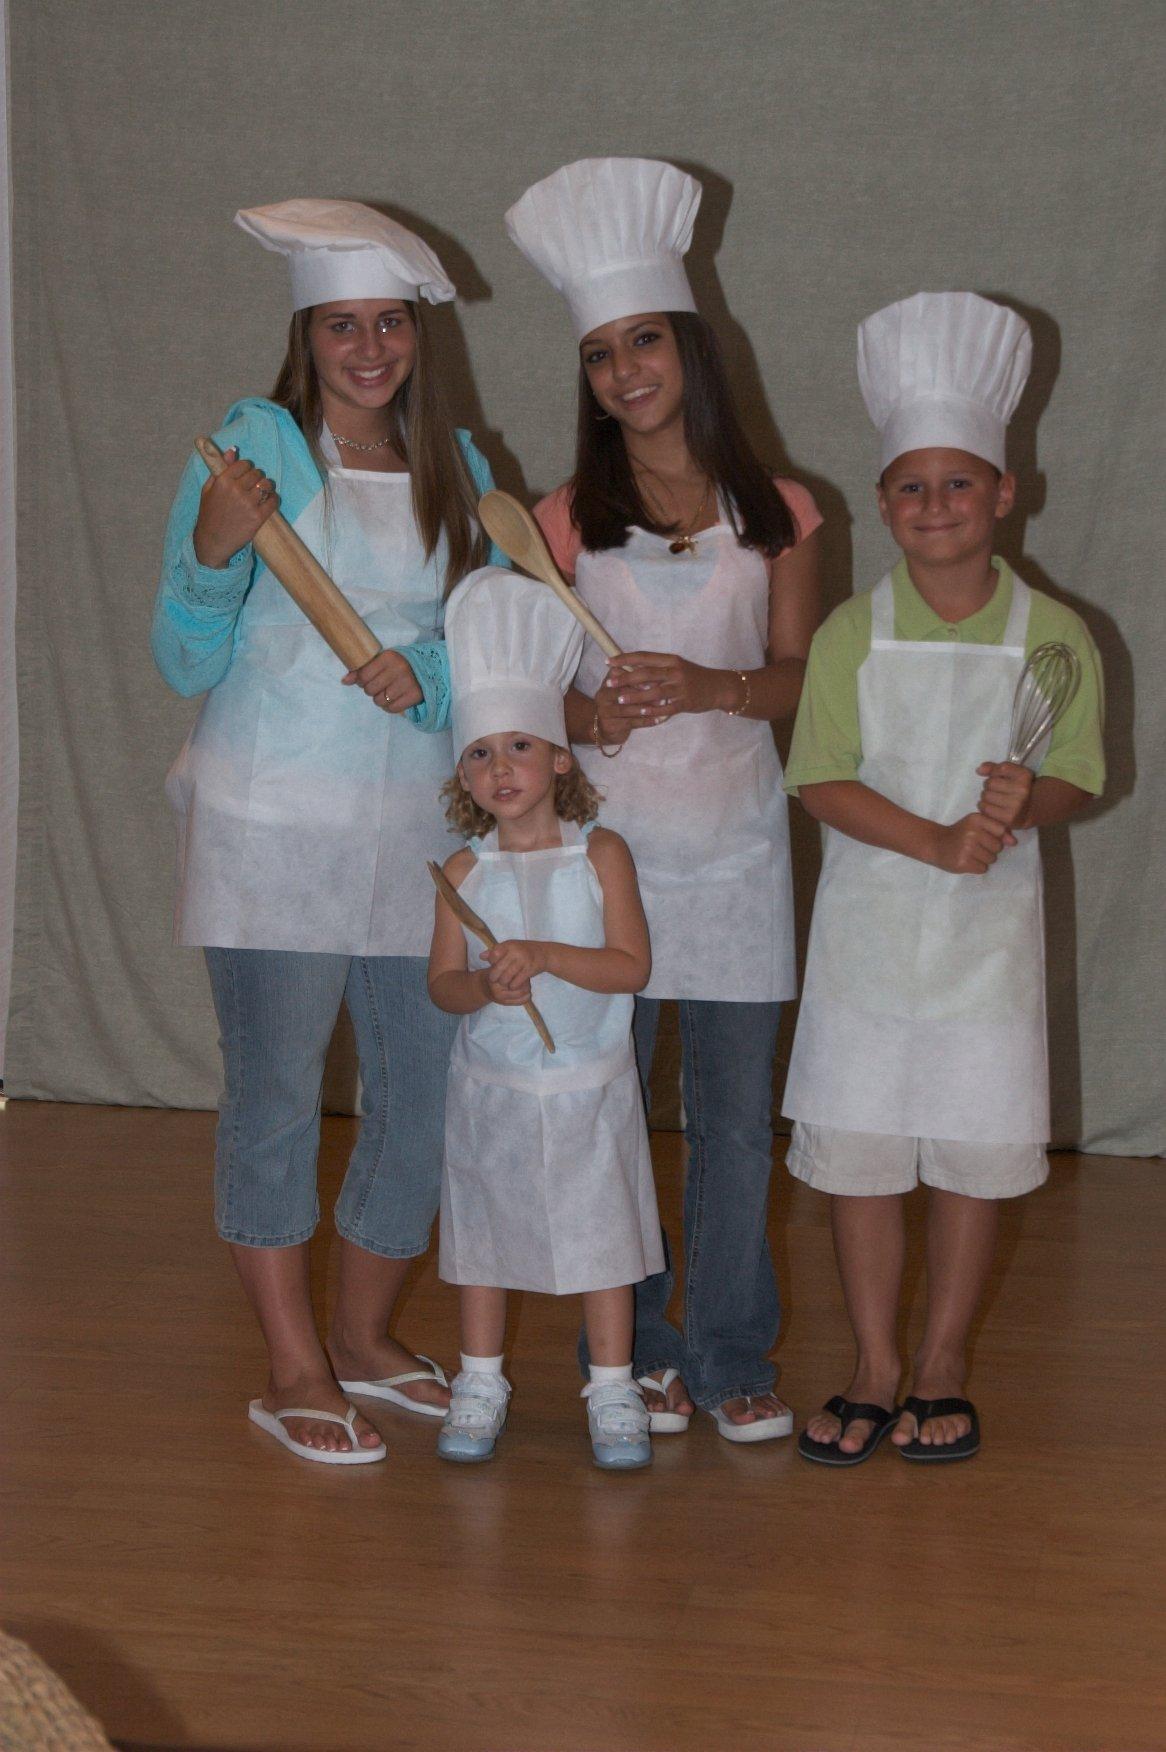 Joyfull ''Linen-look'' Children's Apron, 10 Pack, Disposable